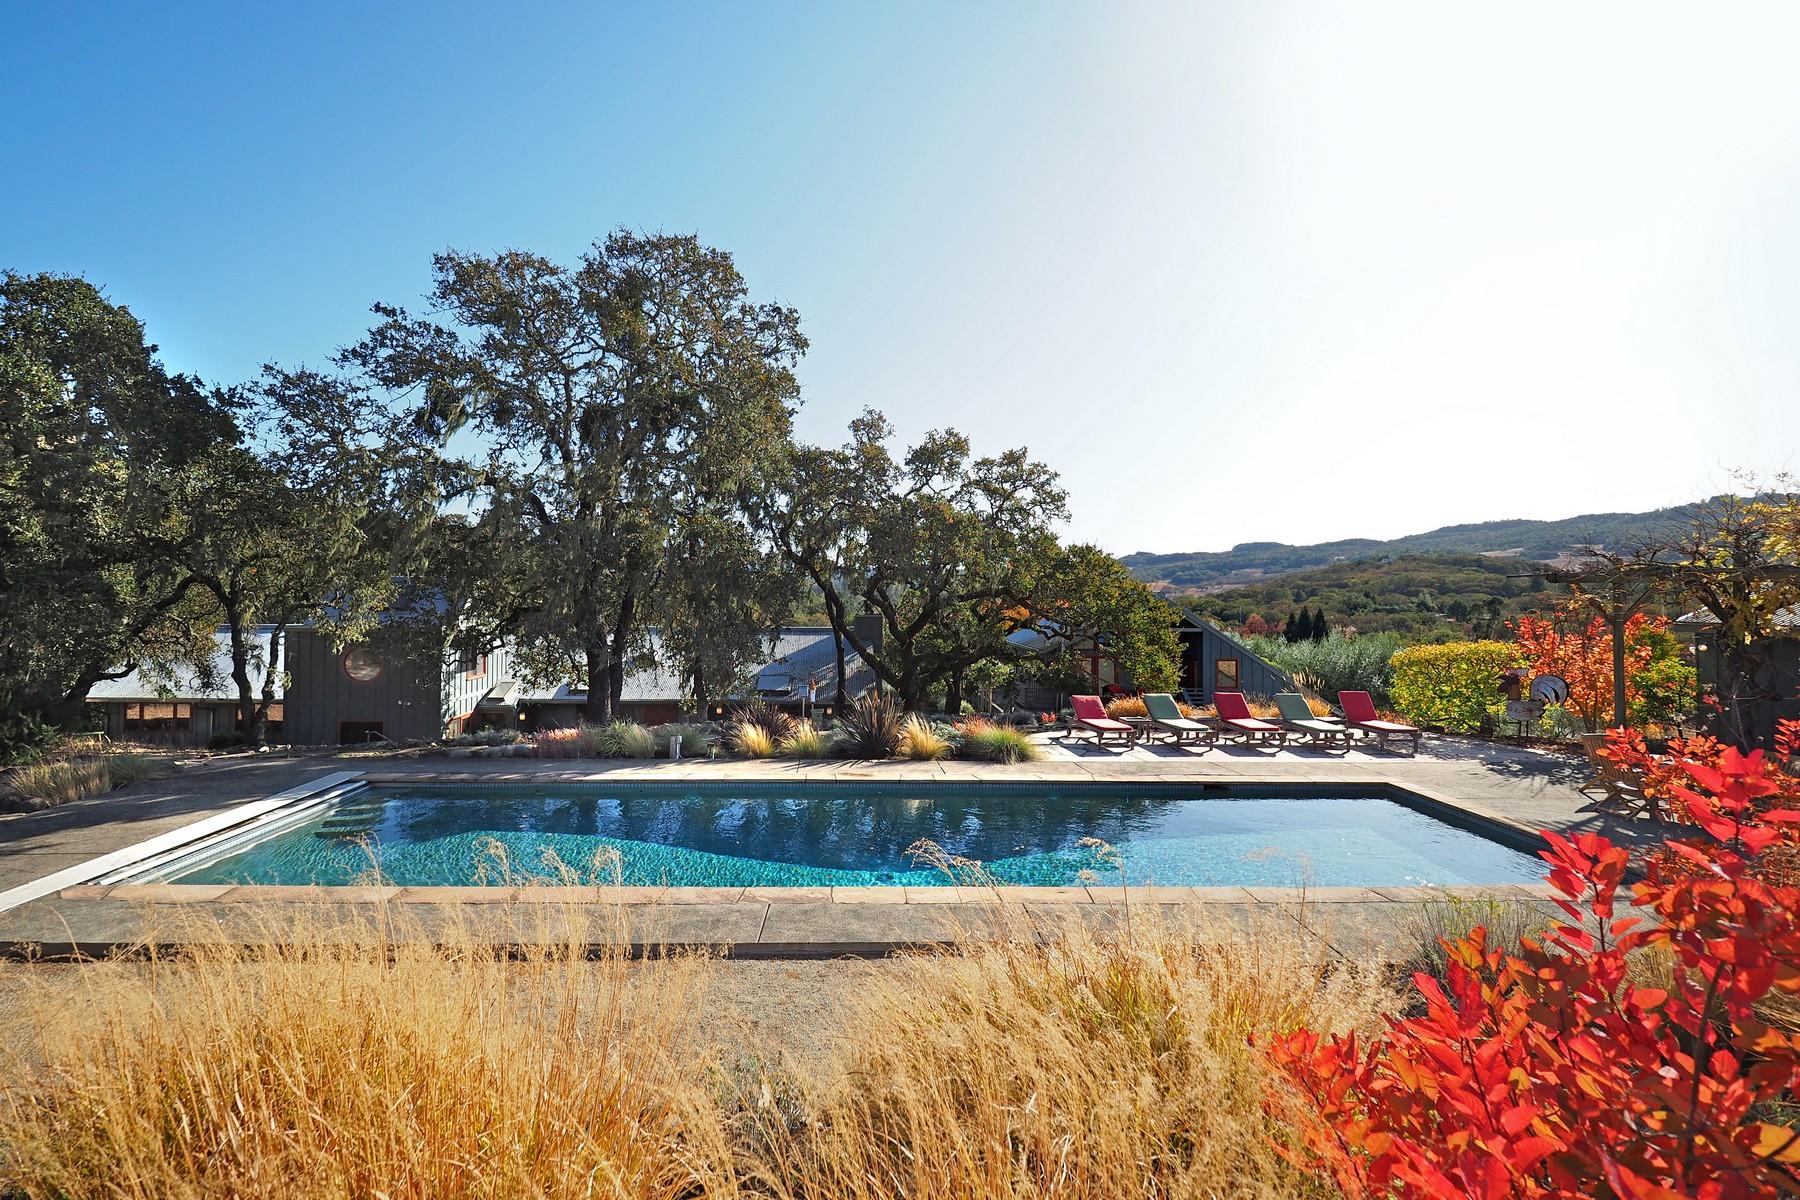 Single Family Homes for Active at 5368 Bennett Valley Road Santa Rosa, California 95404 United States